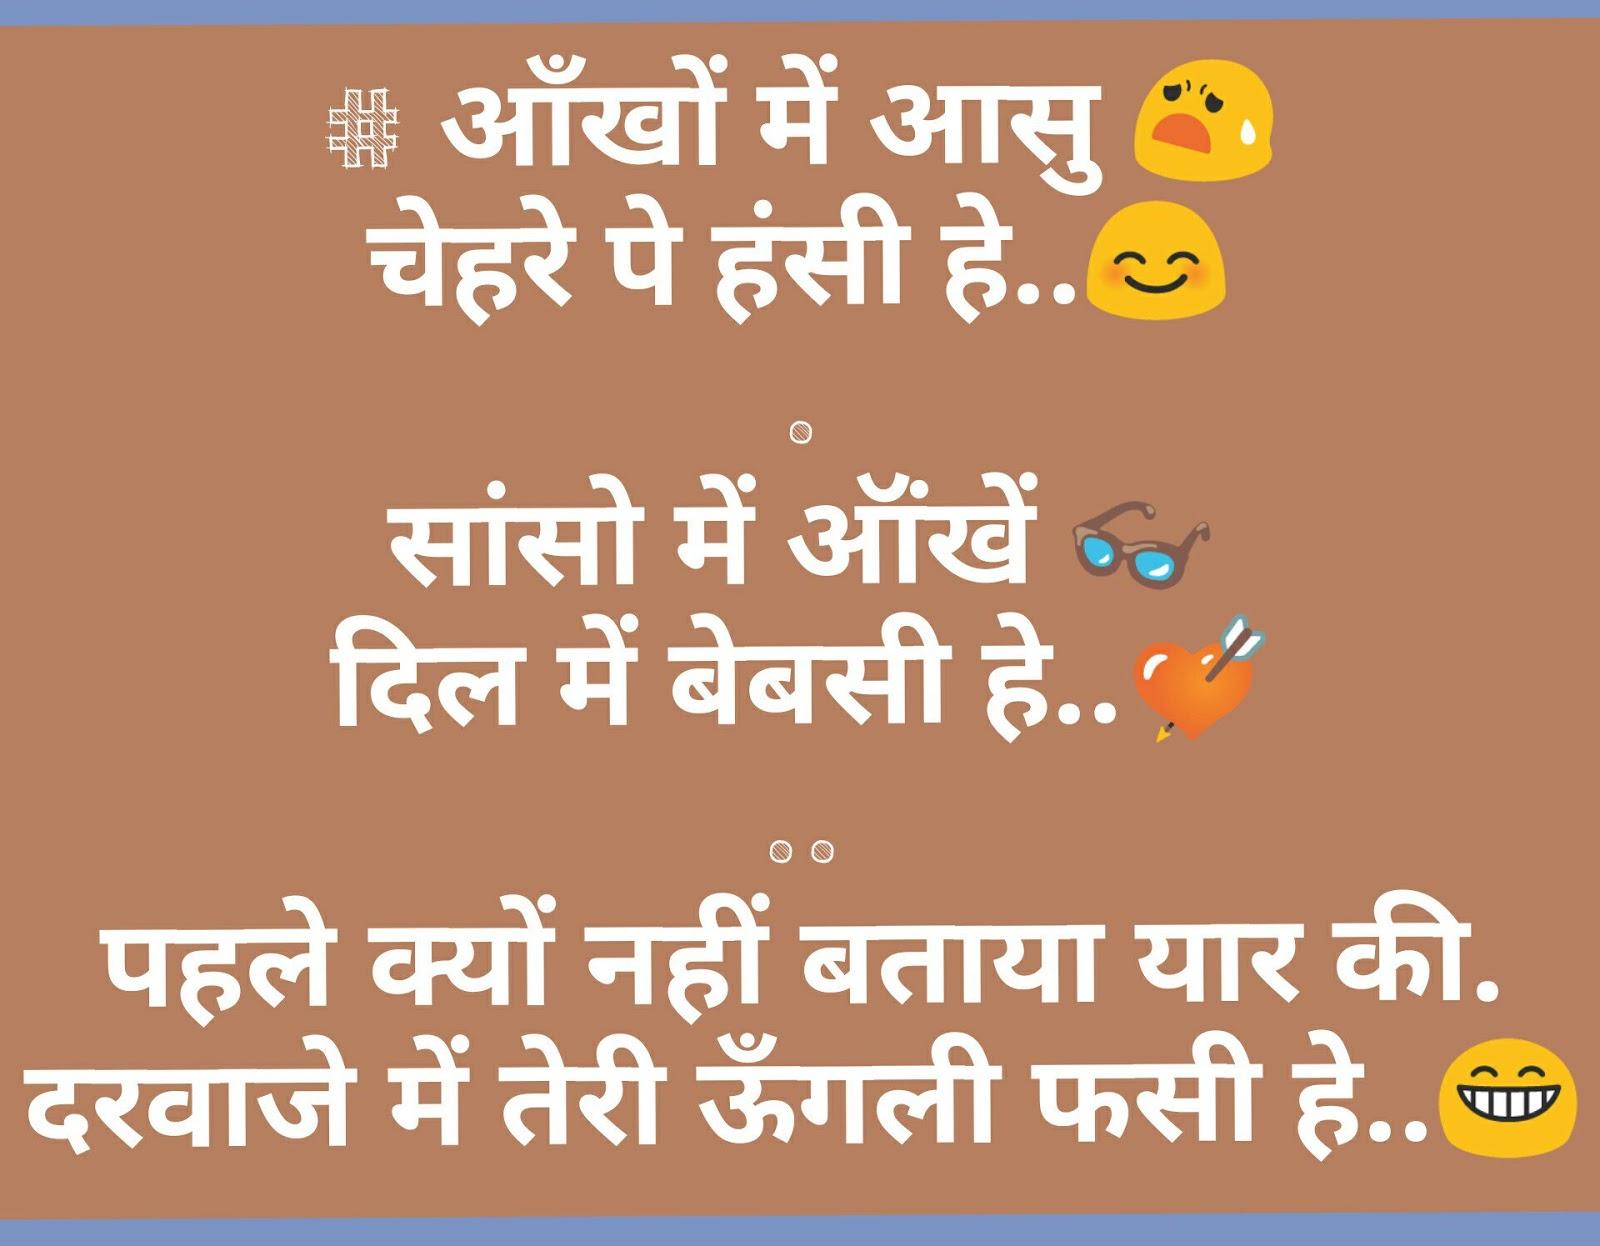 BEST} Funny Shayari in Hindi | Comedy Shayari images